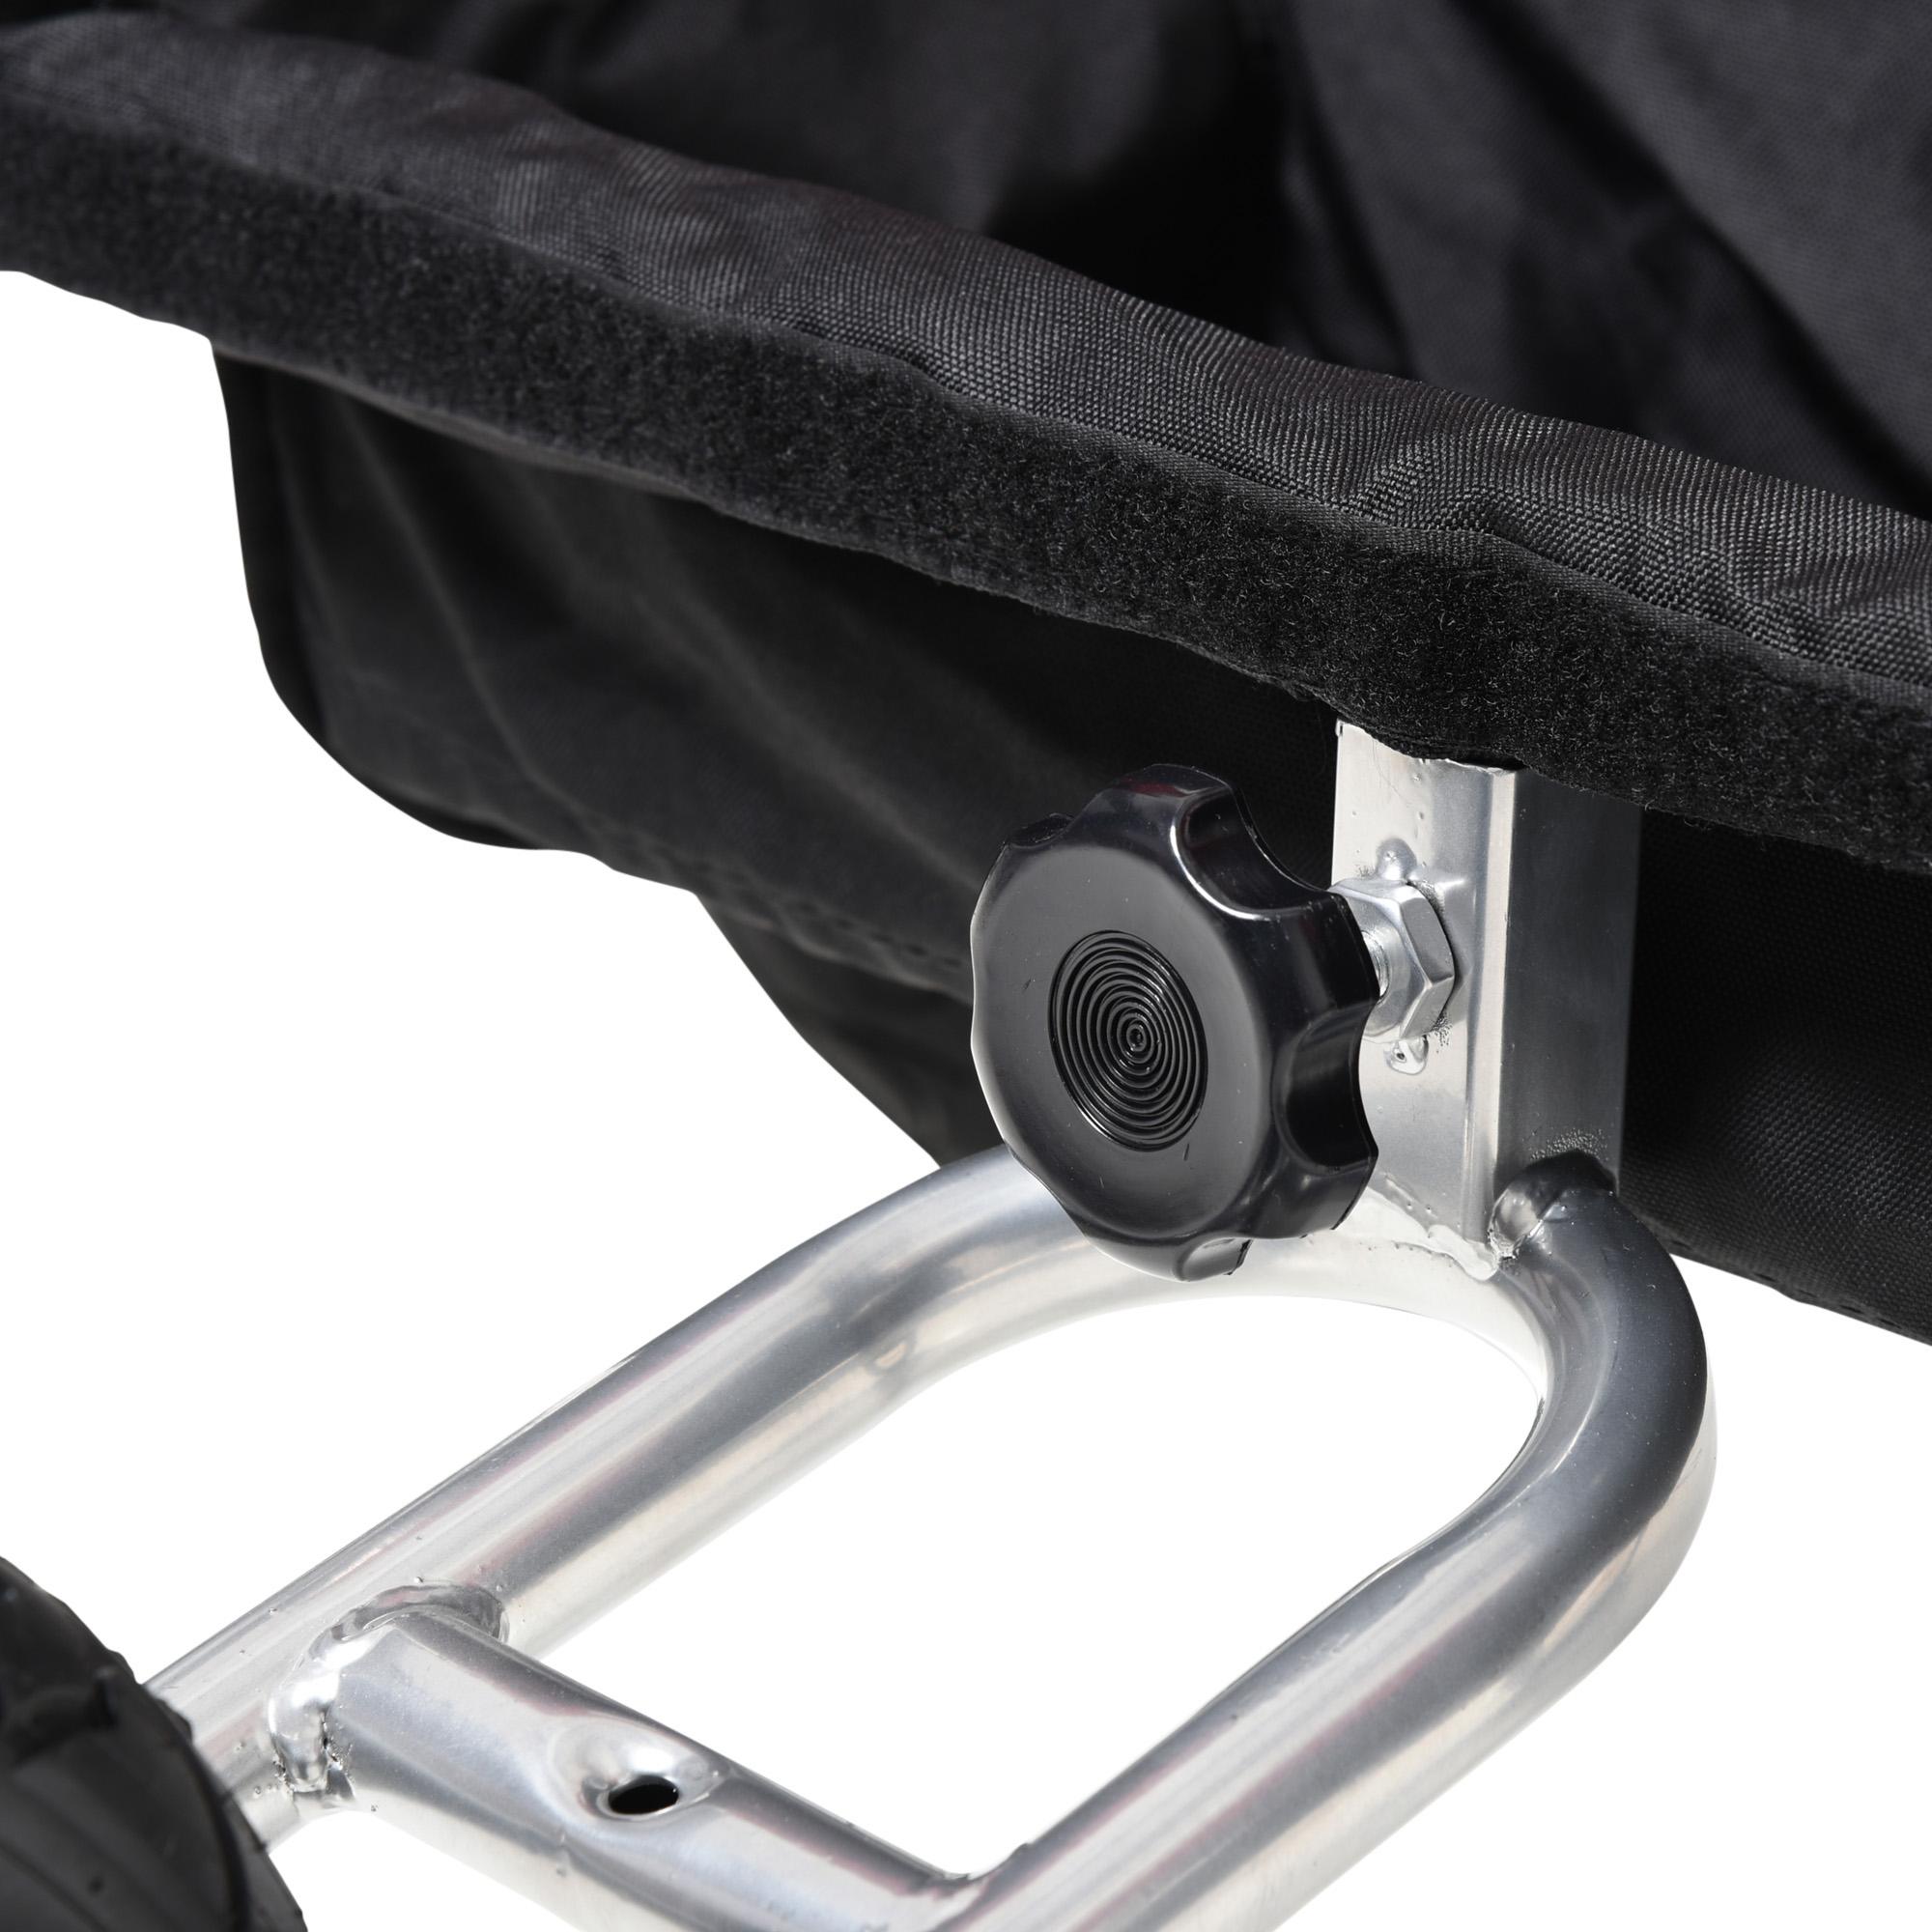 miniatura 43 - Remolque Bicicleta Niño 2 PLAZAS+Amortiguador Kit Footing Freno Bandera Cubierta